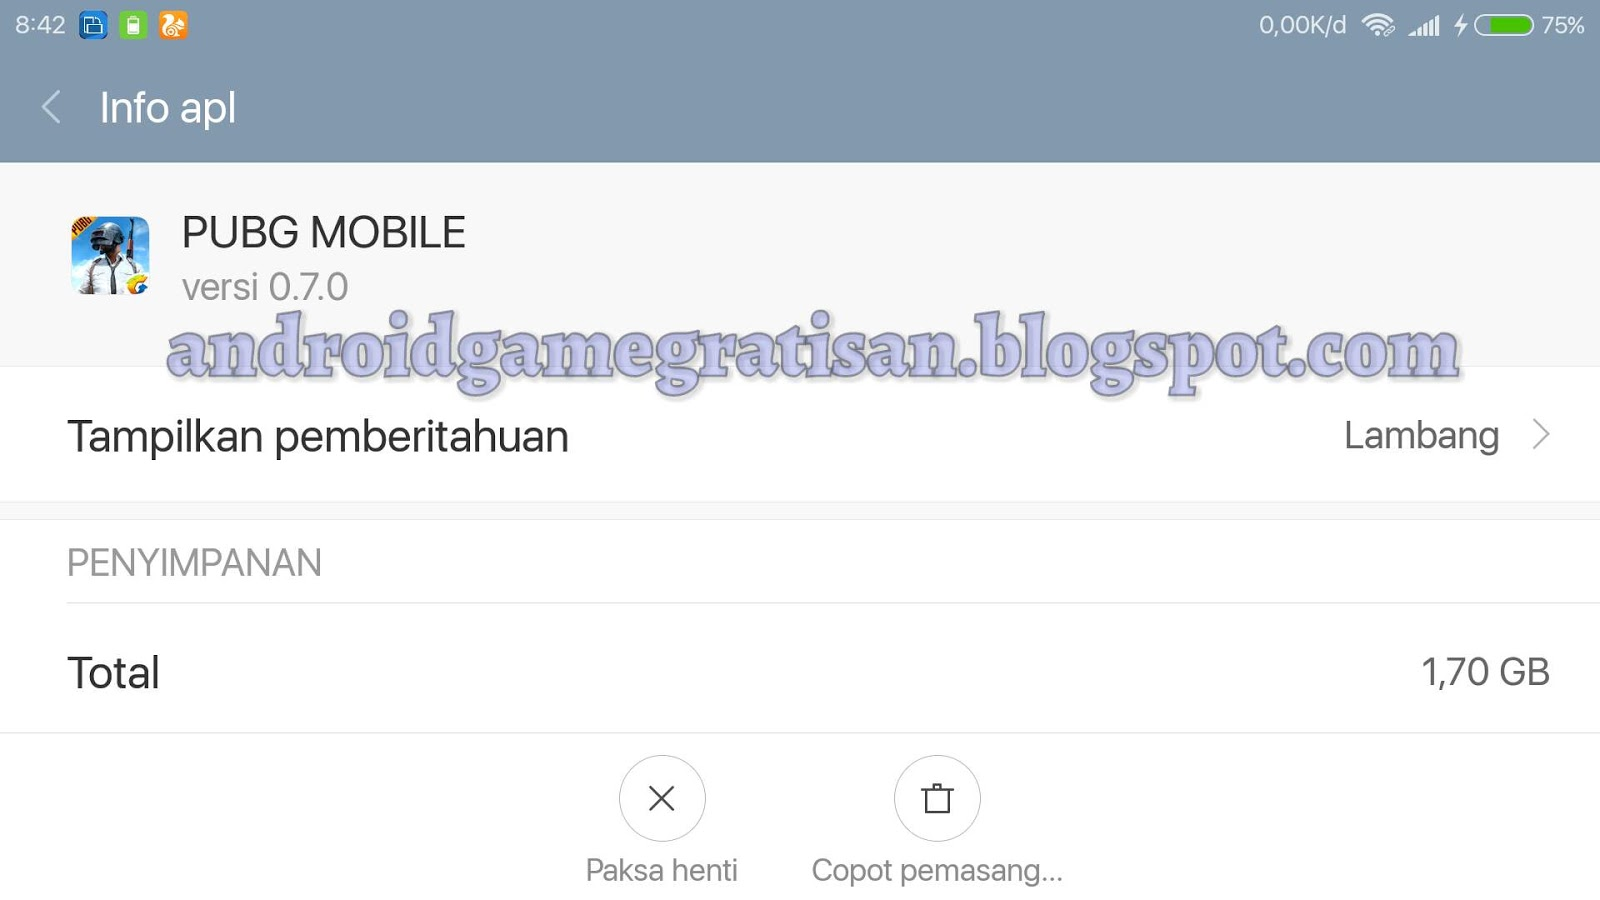 Pubg Mobile V0 11 0 Apk Obb Data: PUBG Mobile Tmi & LightSpeed English Apk + Obb